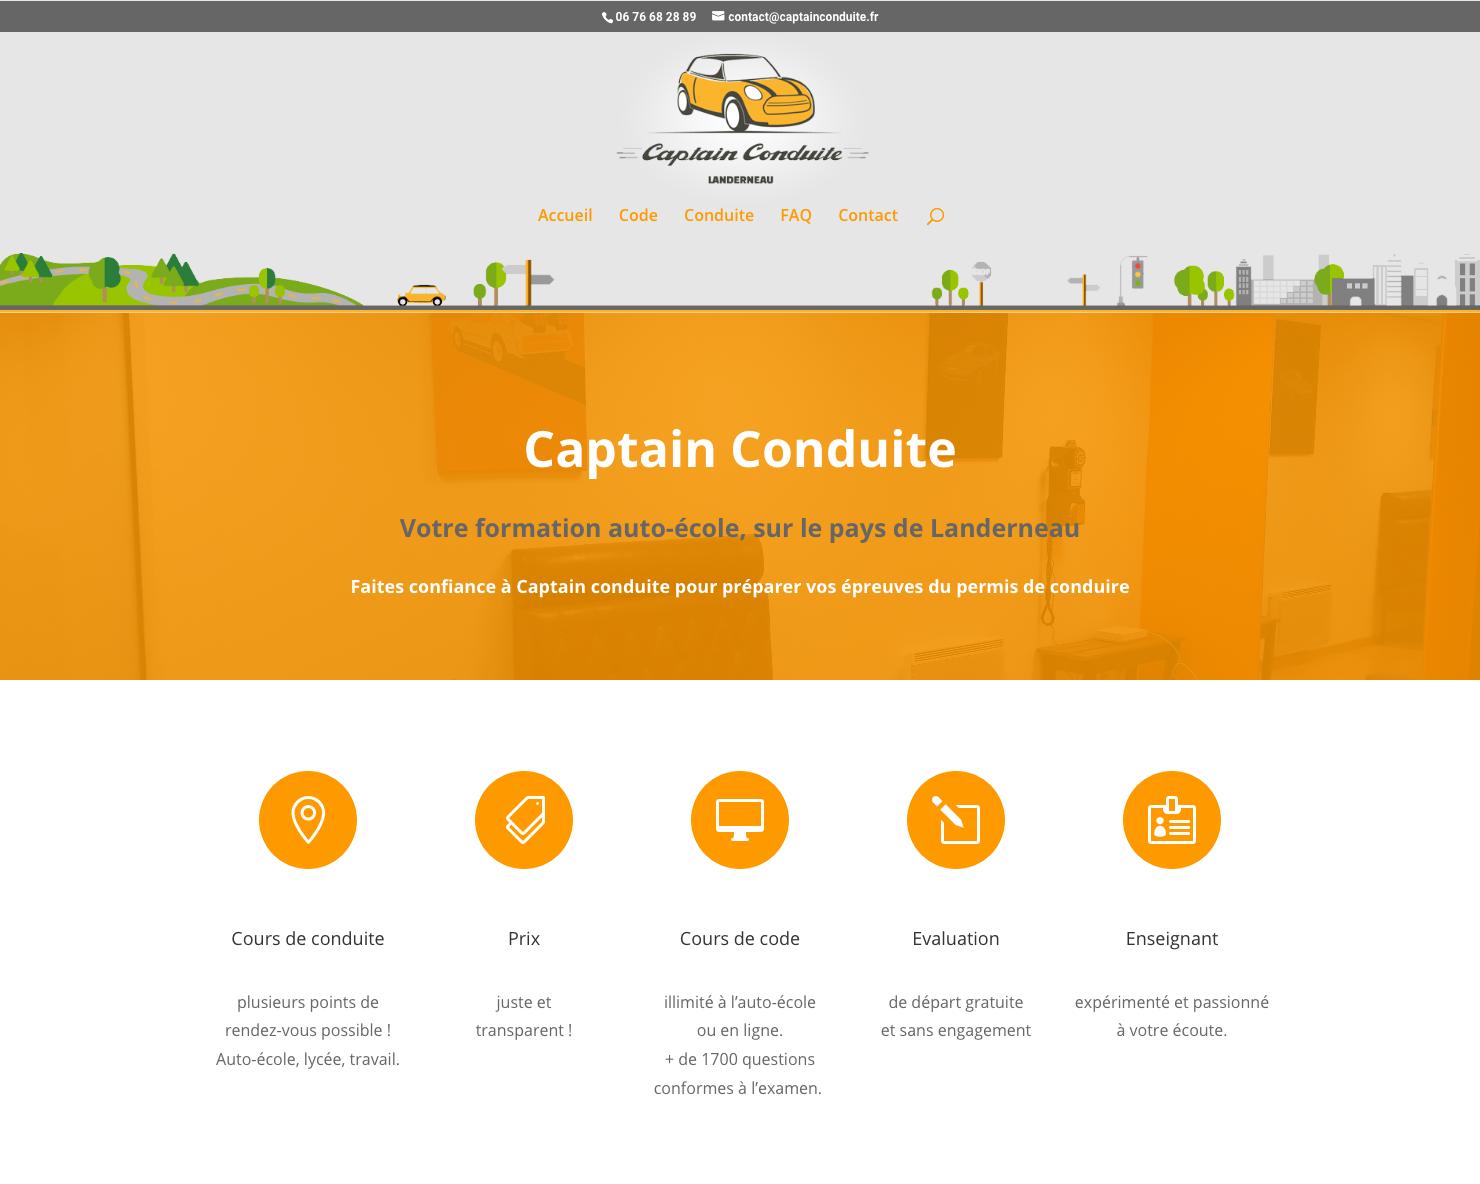 Captain Conduite